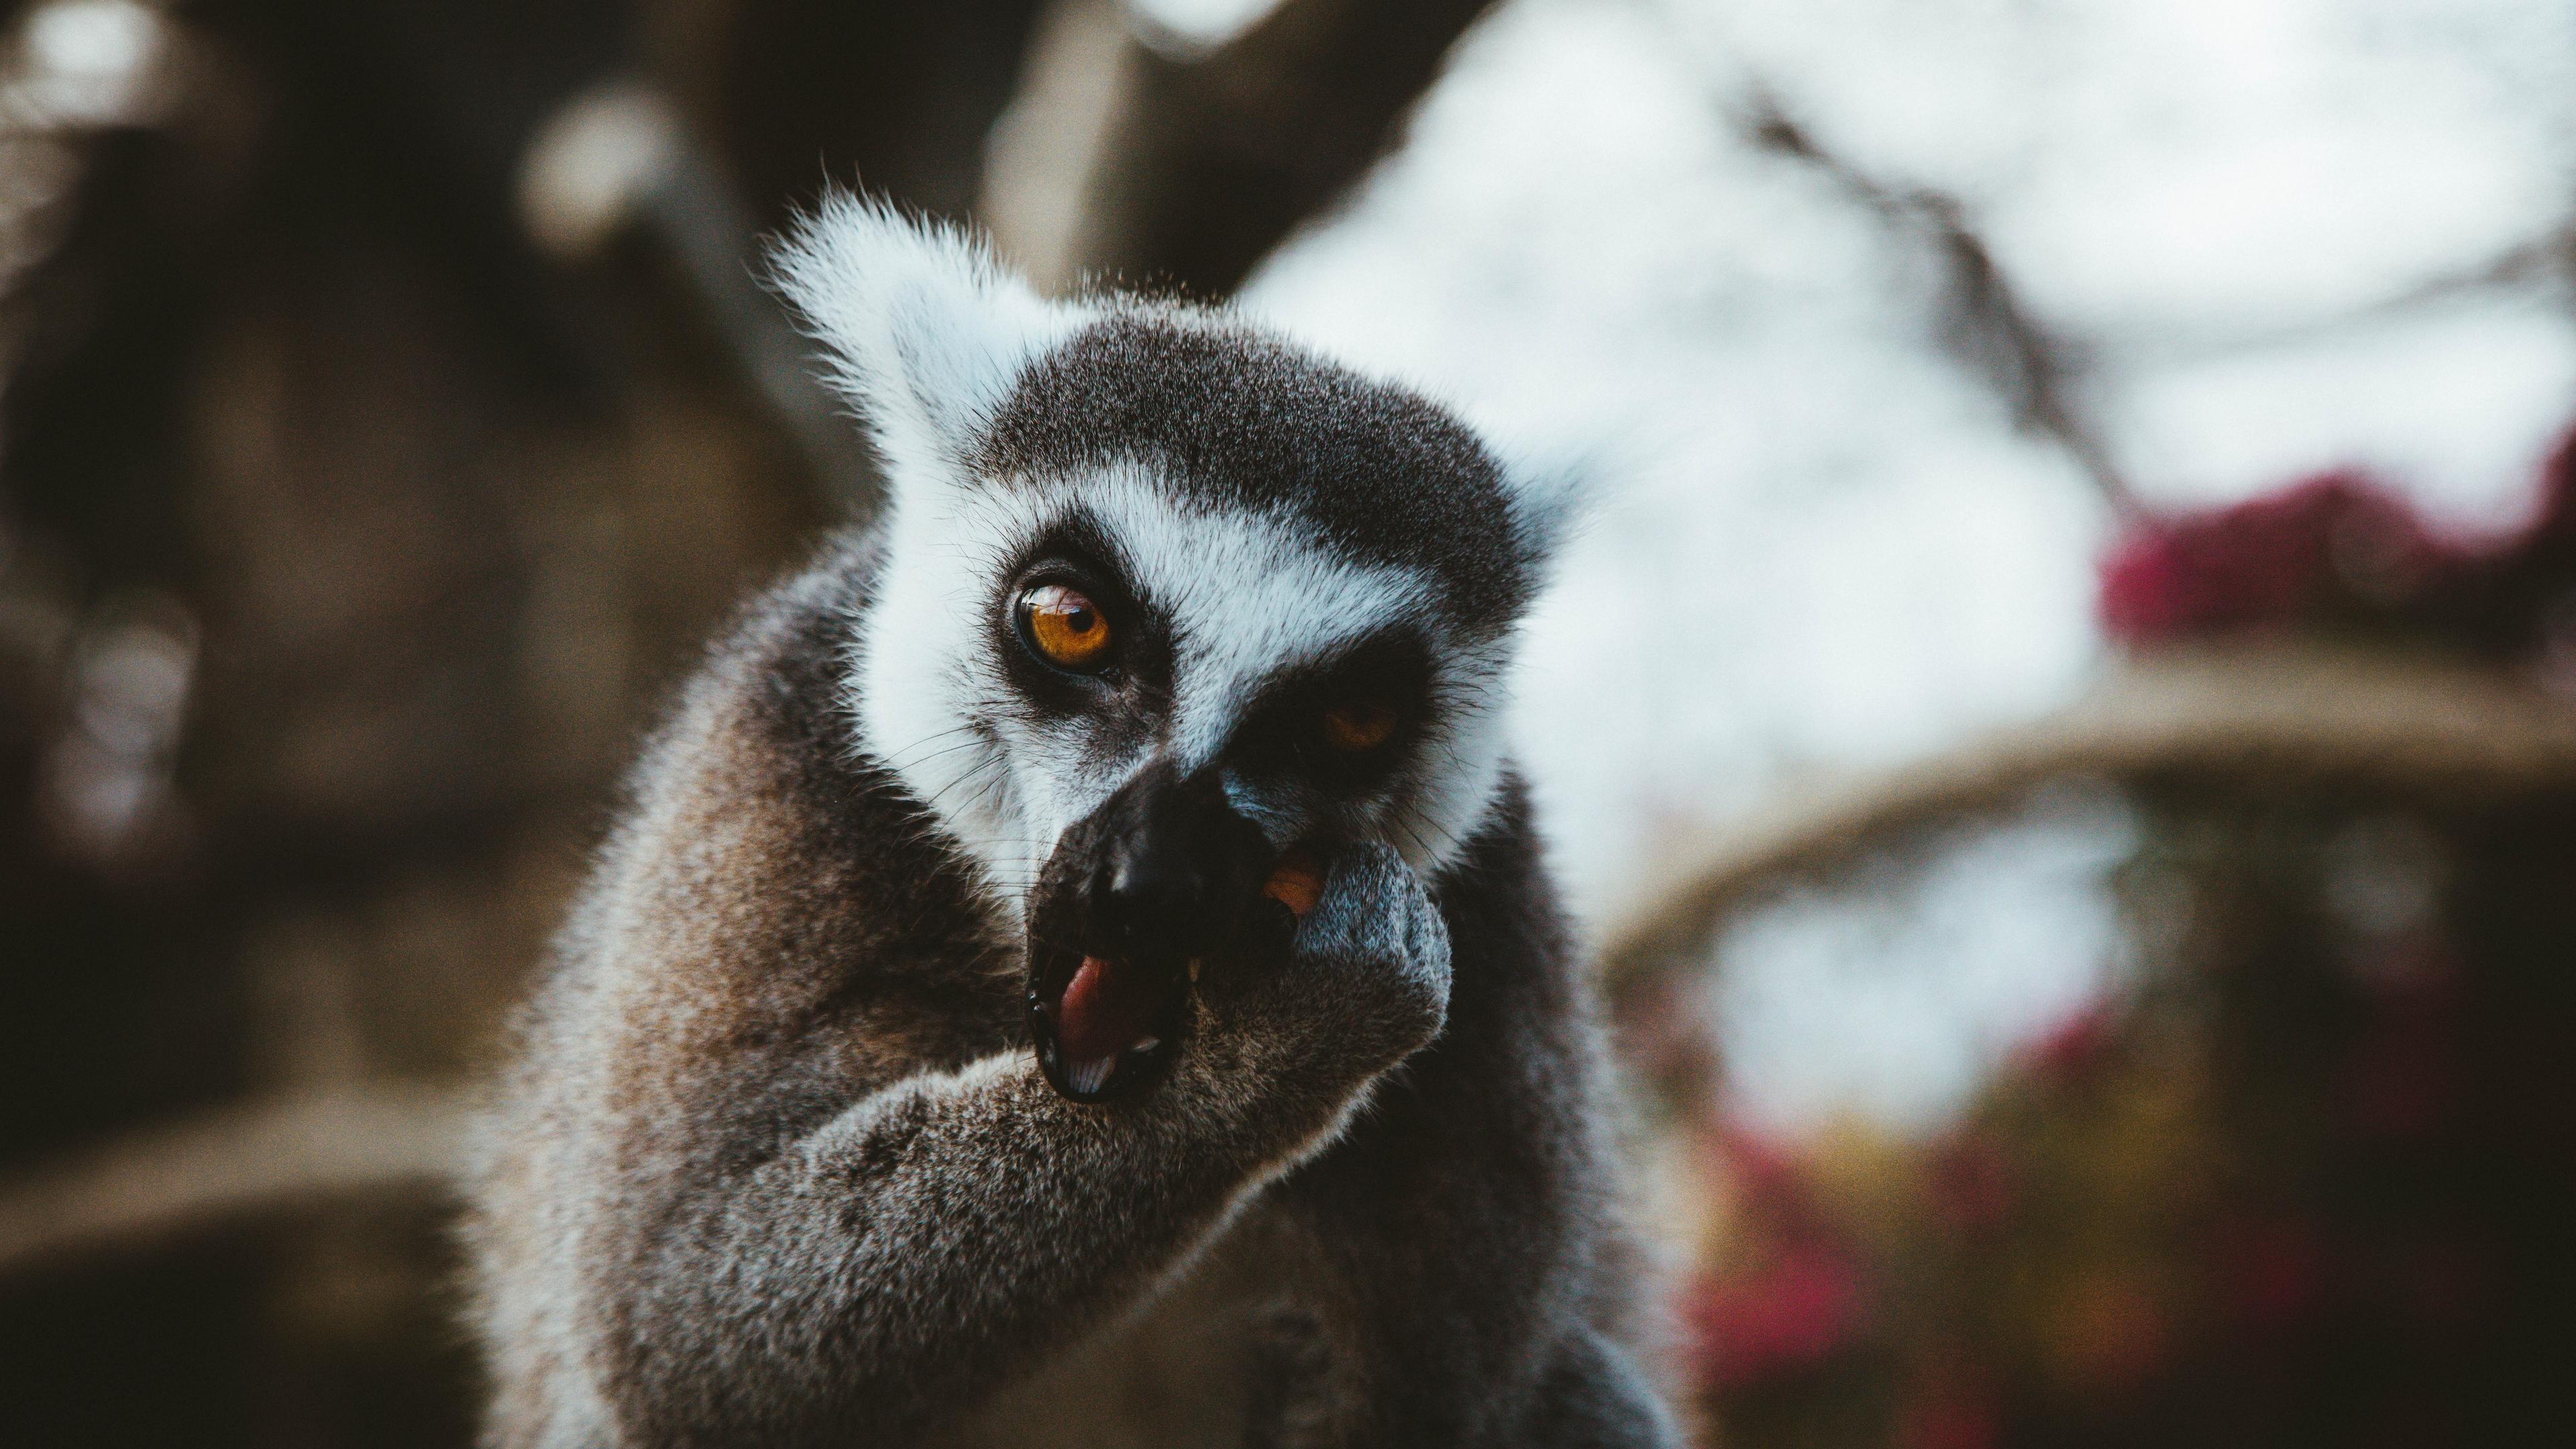 lemur animal muzzle eat 4k 1542242787 - lemur, animal, muzzle, eat 4k - muzzle, lemur, Animal